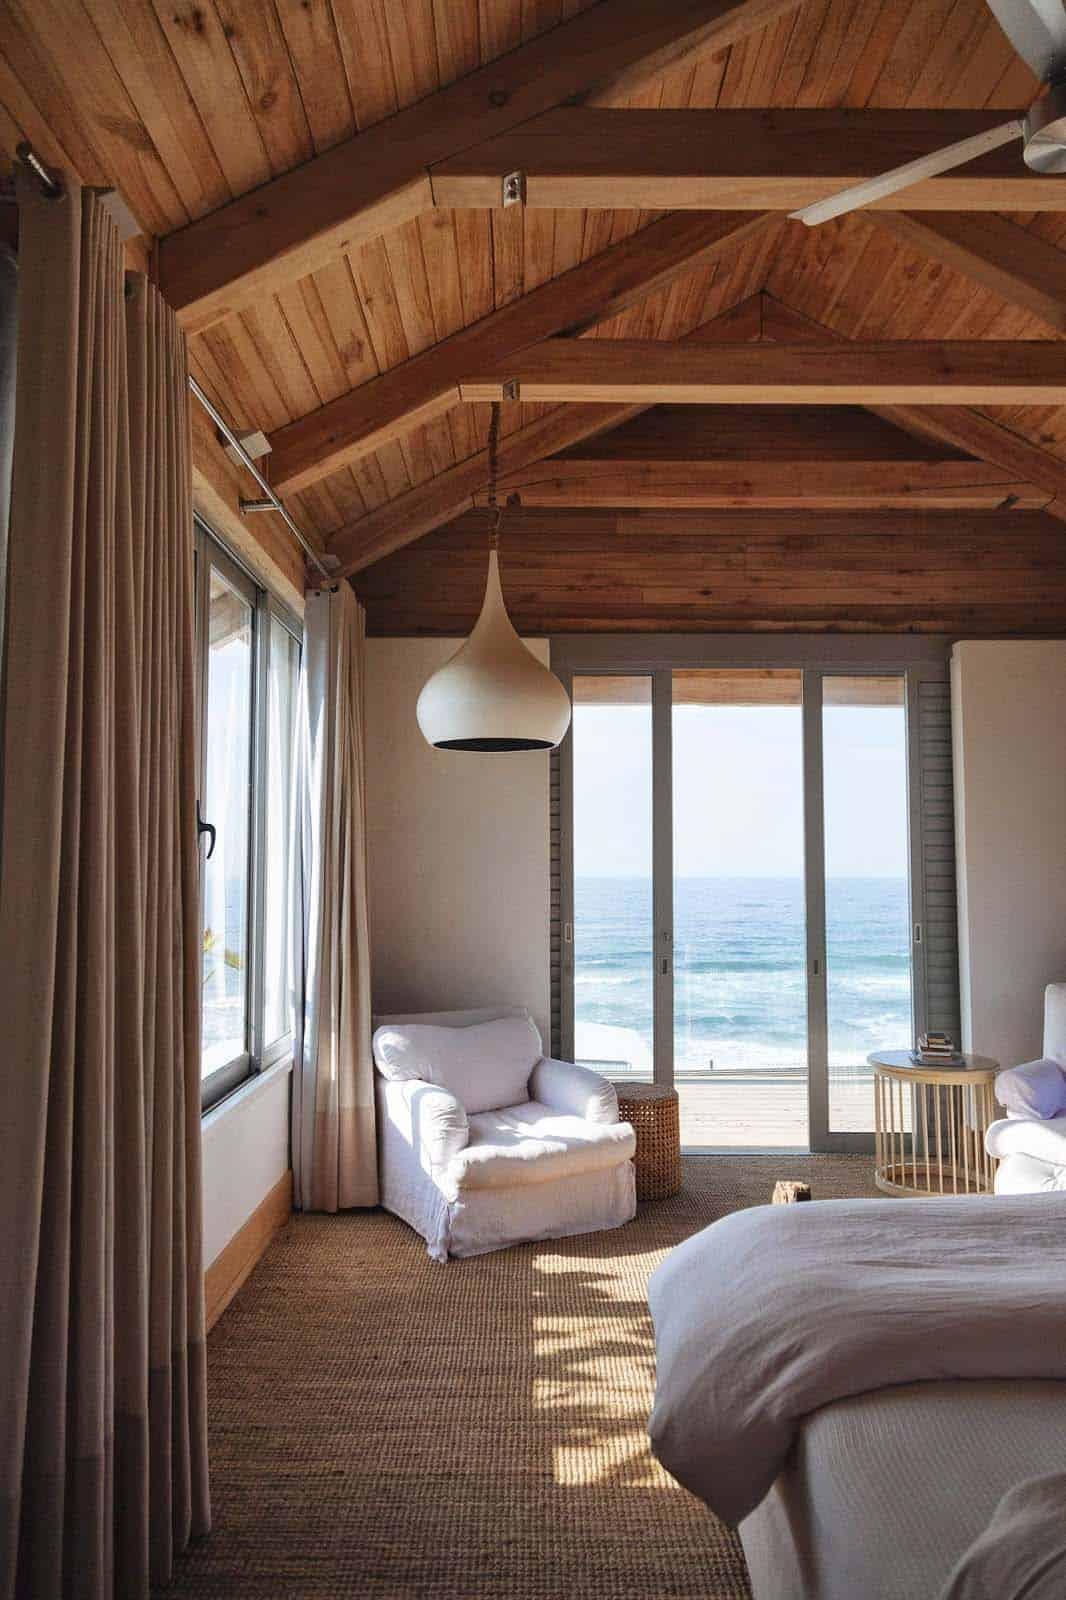 Bedroom With Ocean Views-25-1 Kindesign